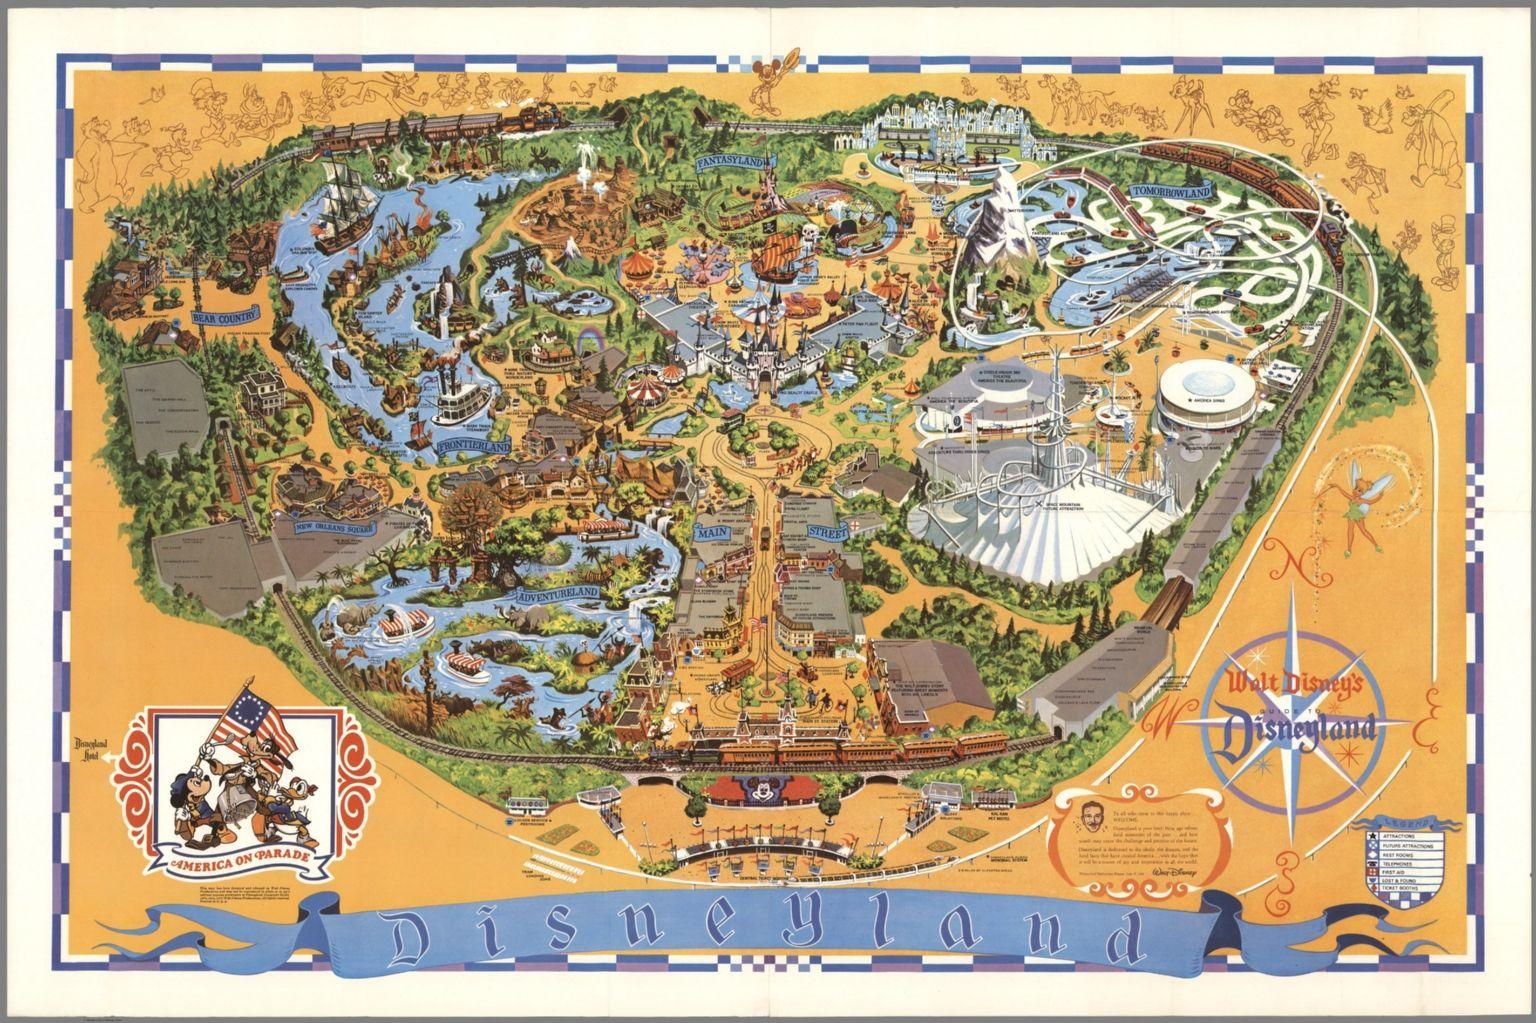 Walt Disney's guide to Disneyland (1975)